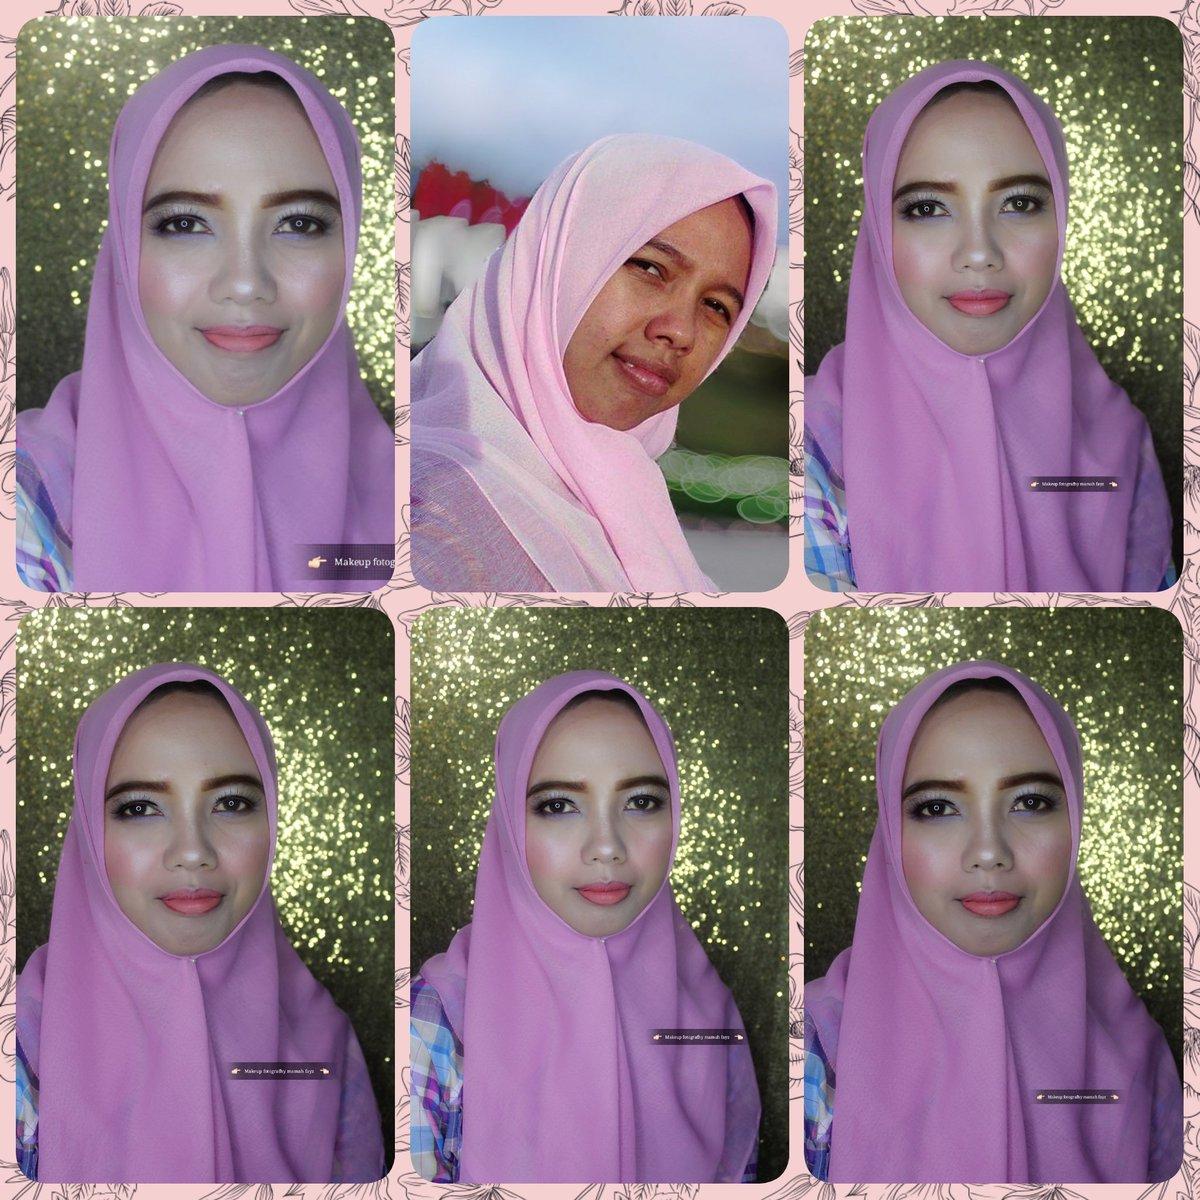 Makeup fotografhy mamah fayz 💄💄#prewedding #riaspengantinlamandau #riaslamandau #riaspengantin #riaspesta #riasfashion #riasfashionshow #riaskondangan #riasperpisahan #hijabmoderen #hijabpengantin #hijabmuslimah #hijabfashion #hijabpesta #lamandau #nangabulik #kalteng https://t.co/NMYtmzPB8D